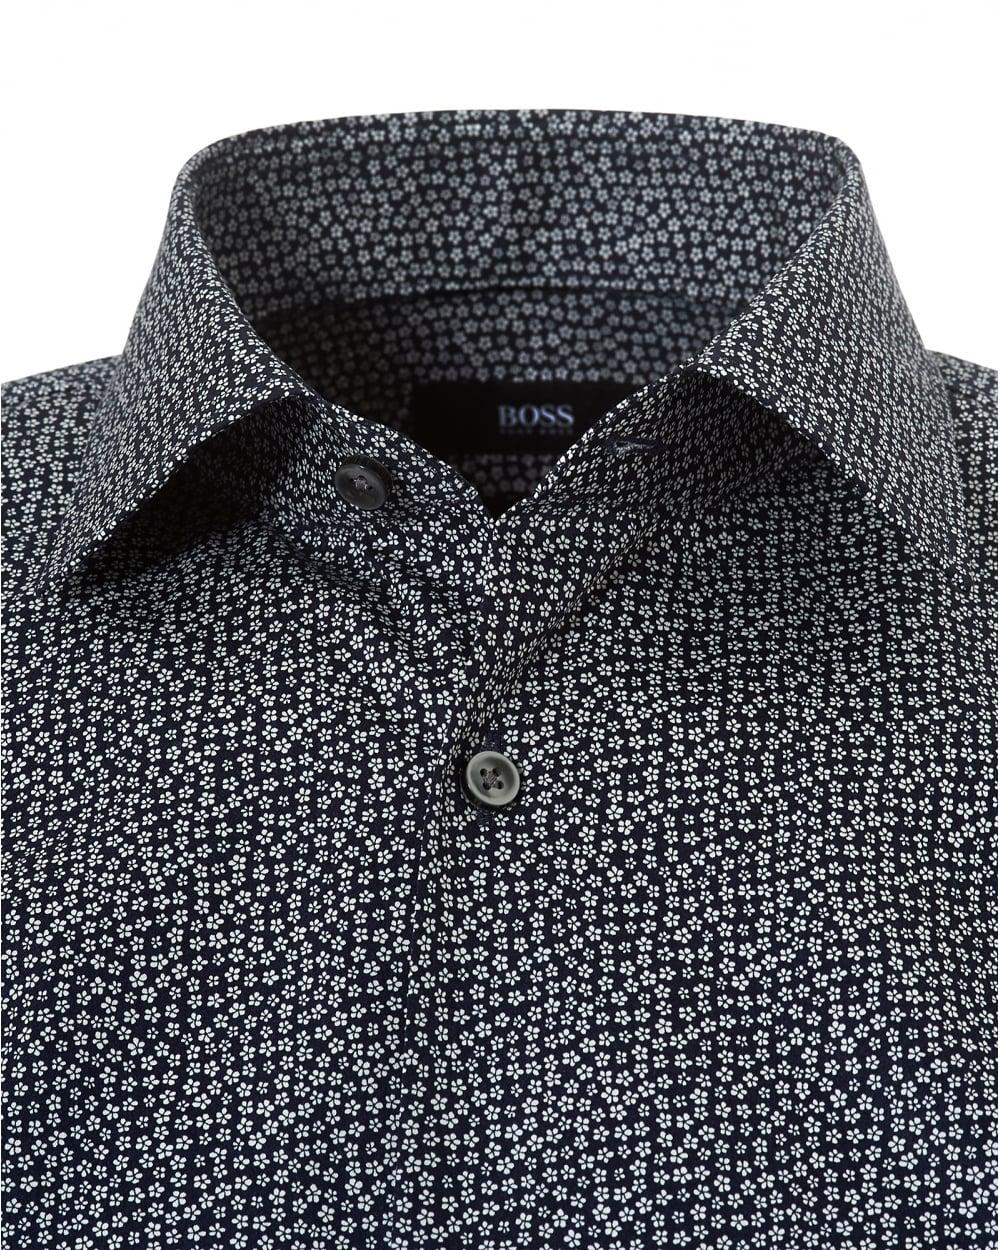 6b5df0cf6 Hugo Boss Black Mens Jenno Micro Floral Pattern Slim Fit Navy Shirt